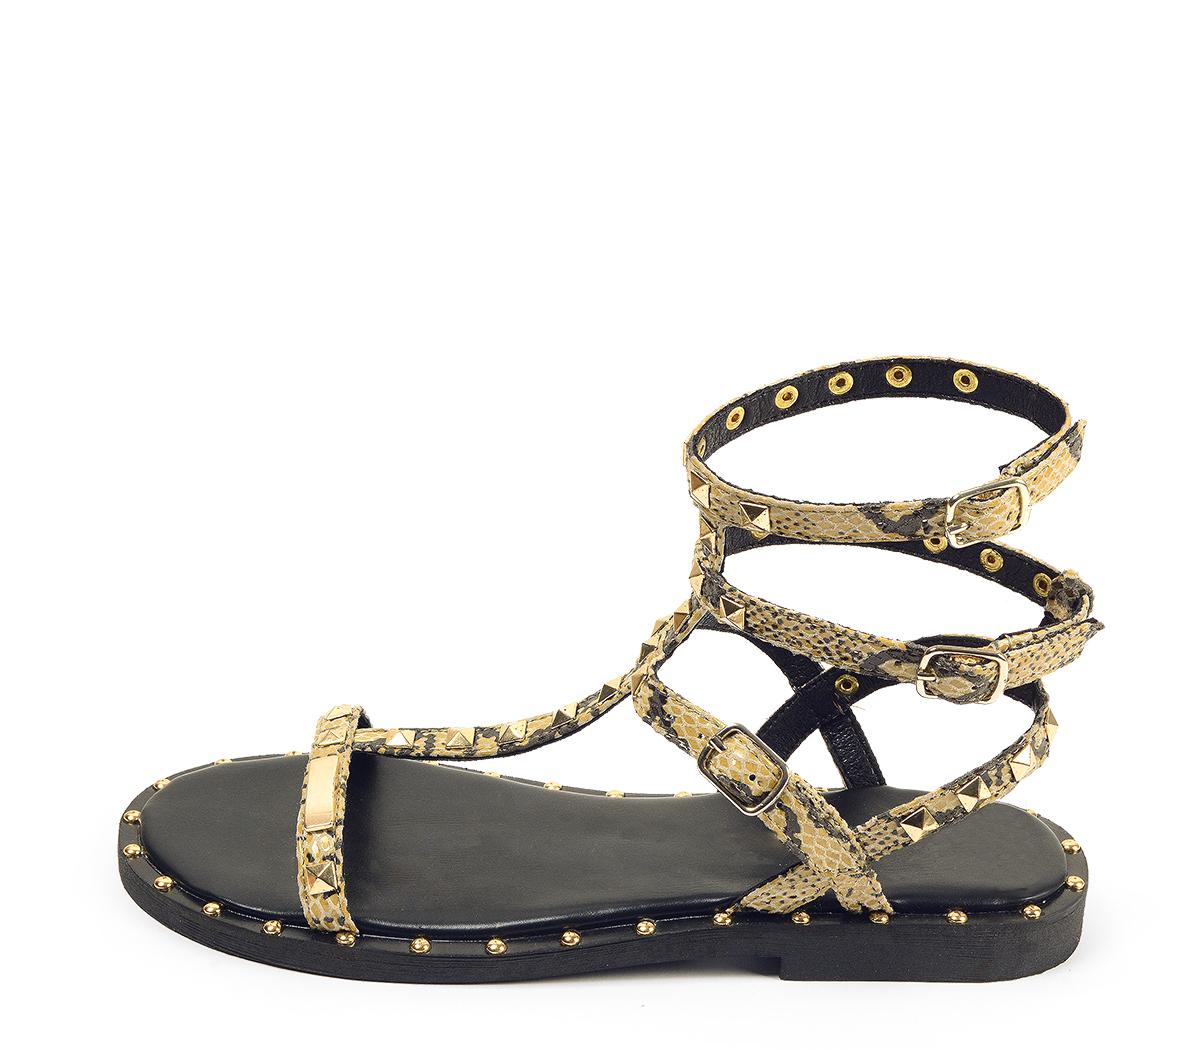 Ref. 4431 Sandalia piel con estampado serpiente estilo romana con detalle piramides doradas. Tiras con 3 hebillas al tobillo.